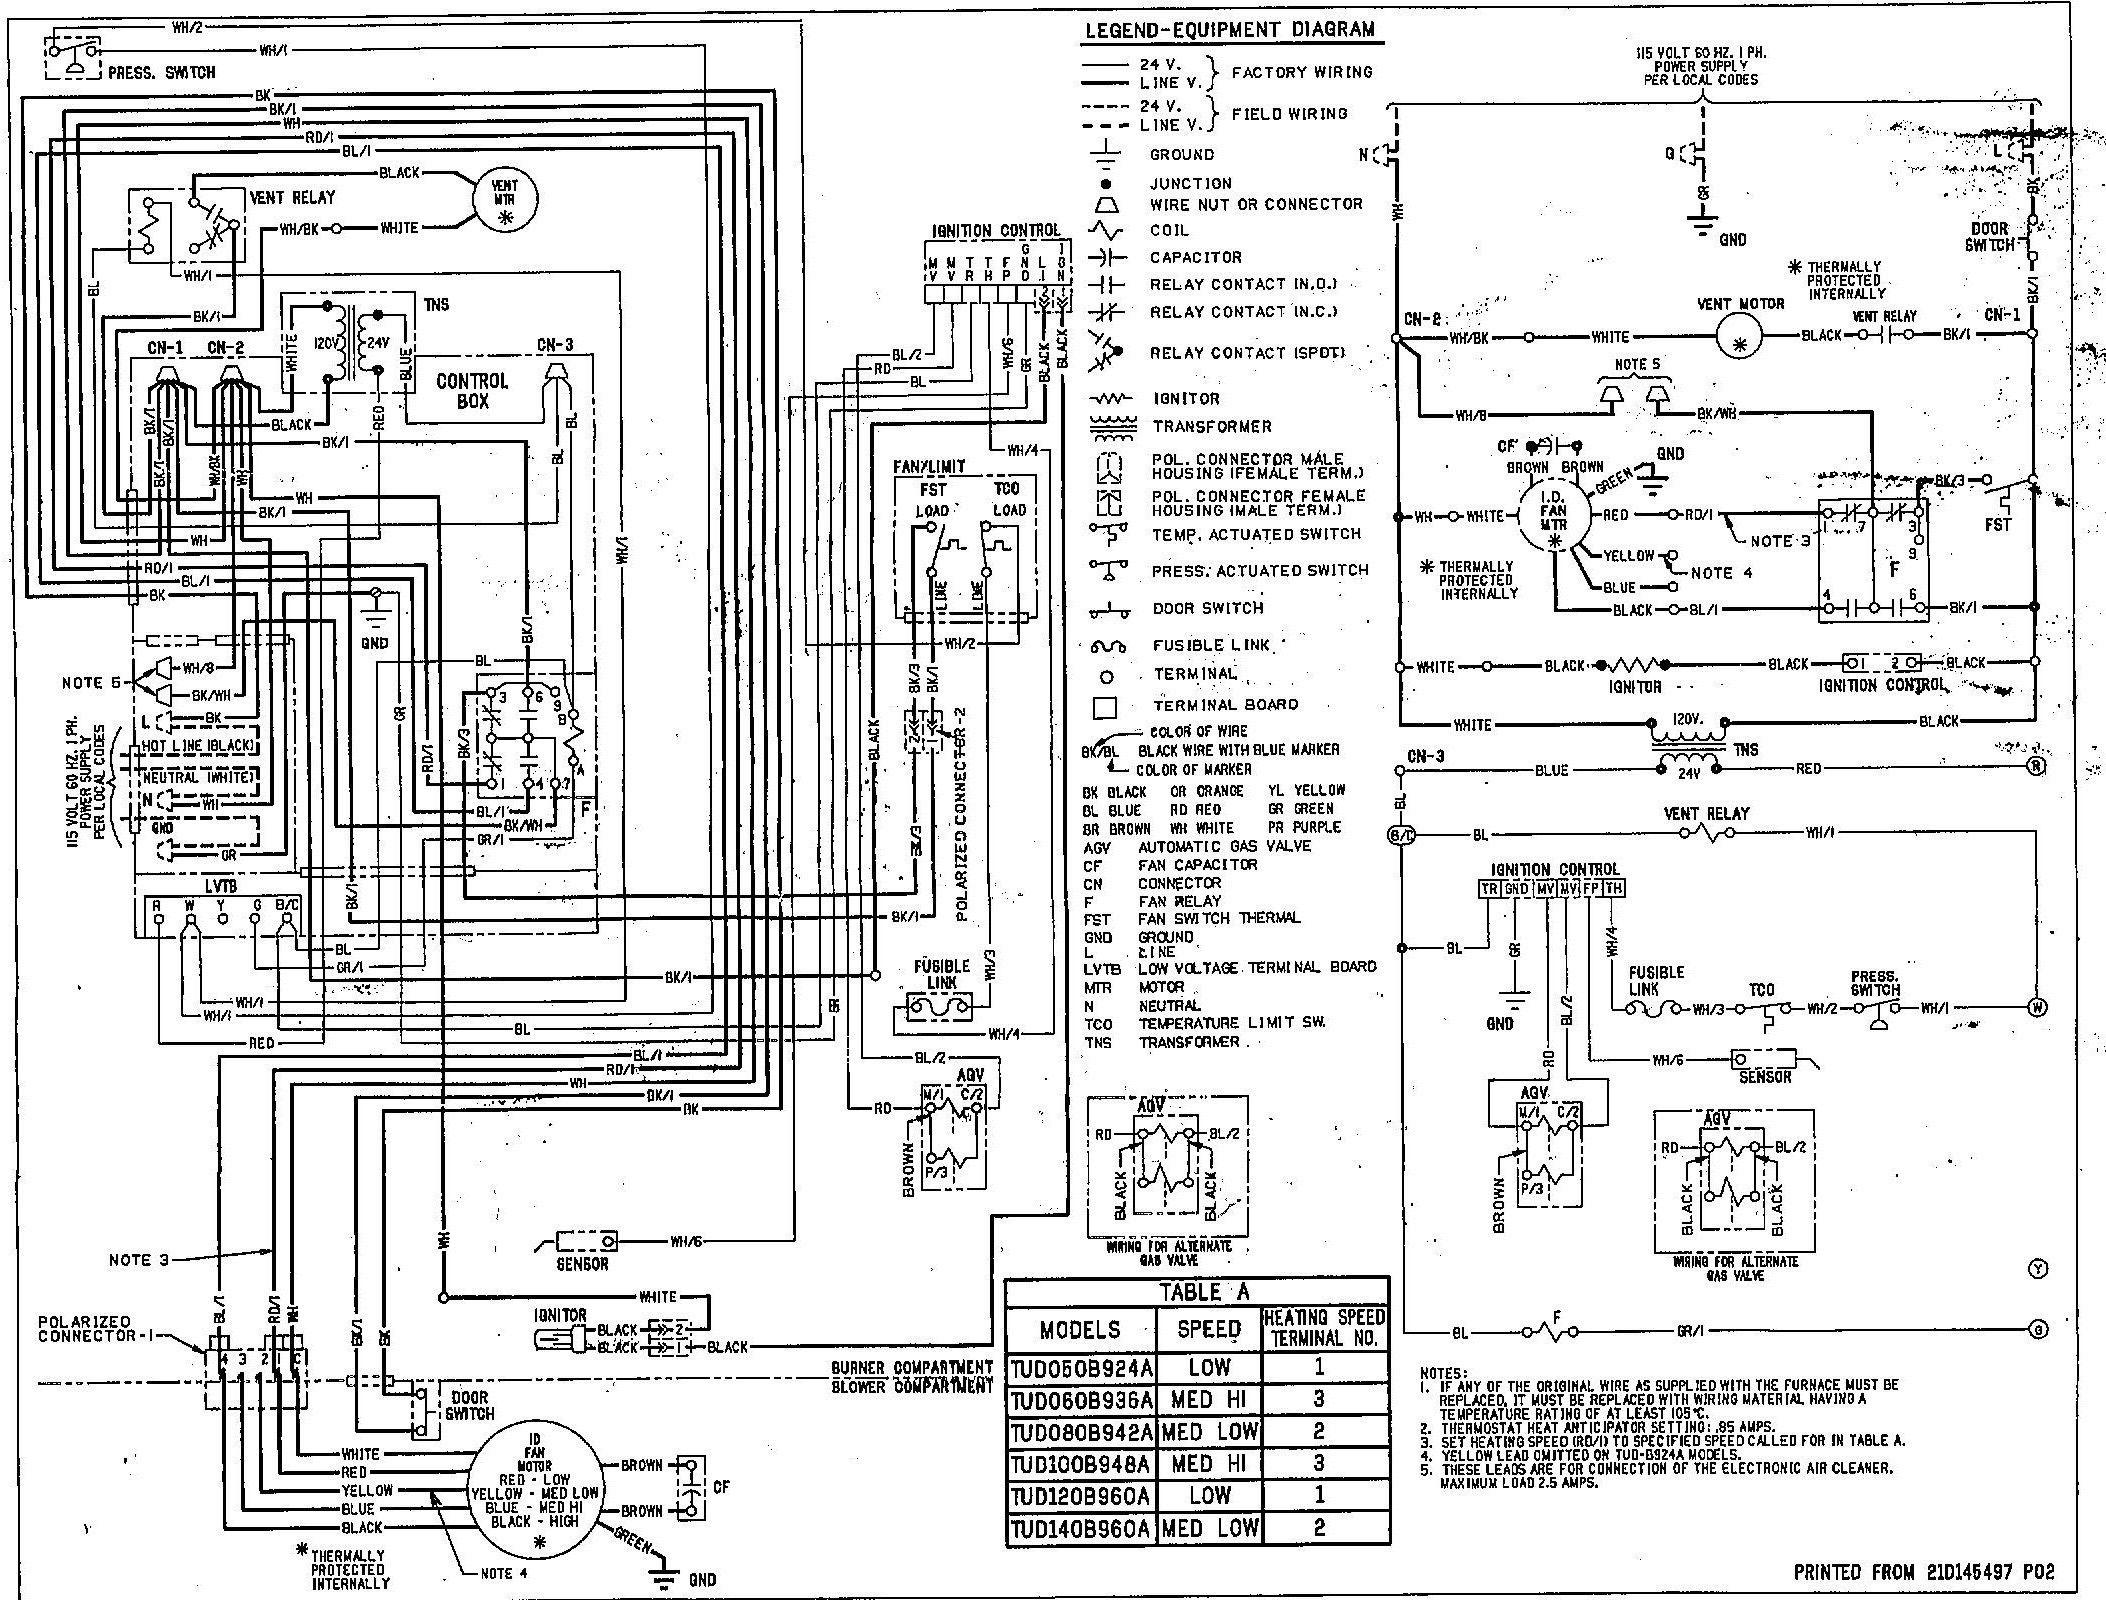 Reznor Heater Wiring Diagram In